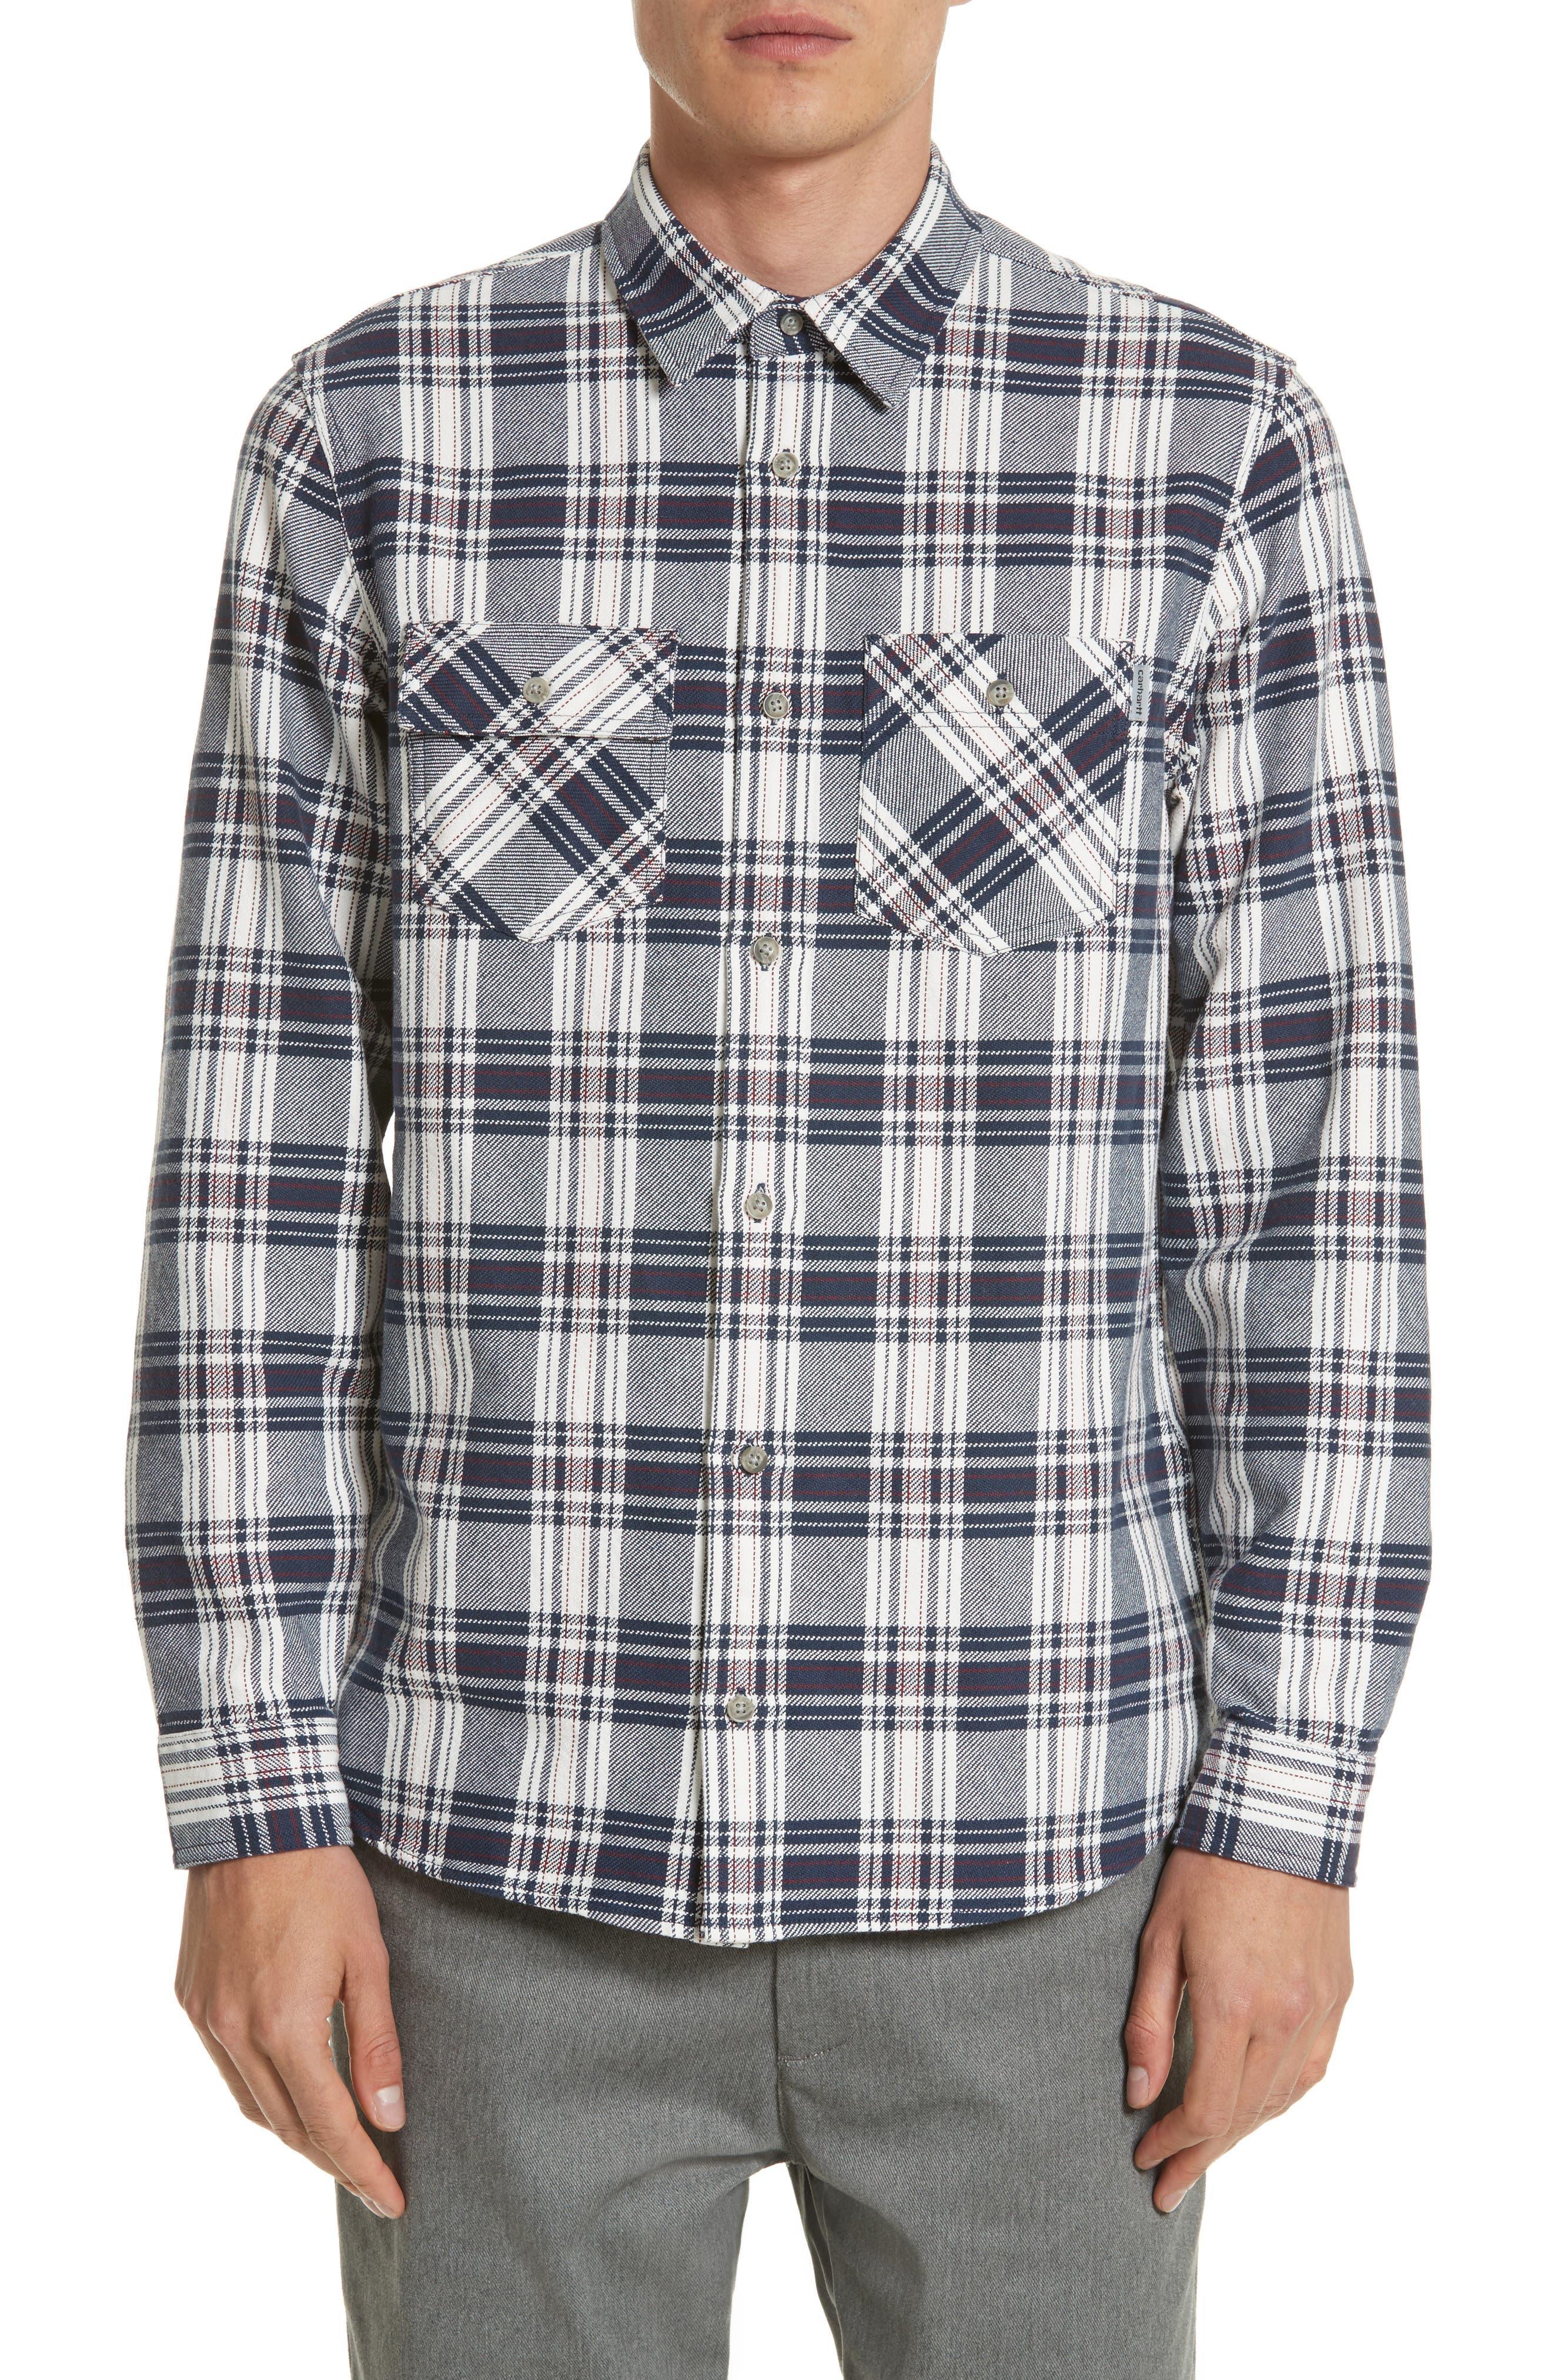 Twill Flannel Shirt,                             Main thumbnail 1, color,                             Snow/ Blue